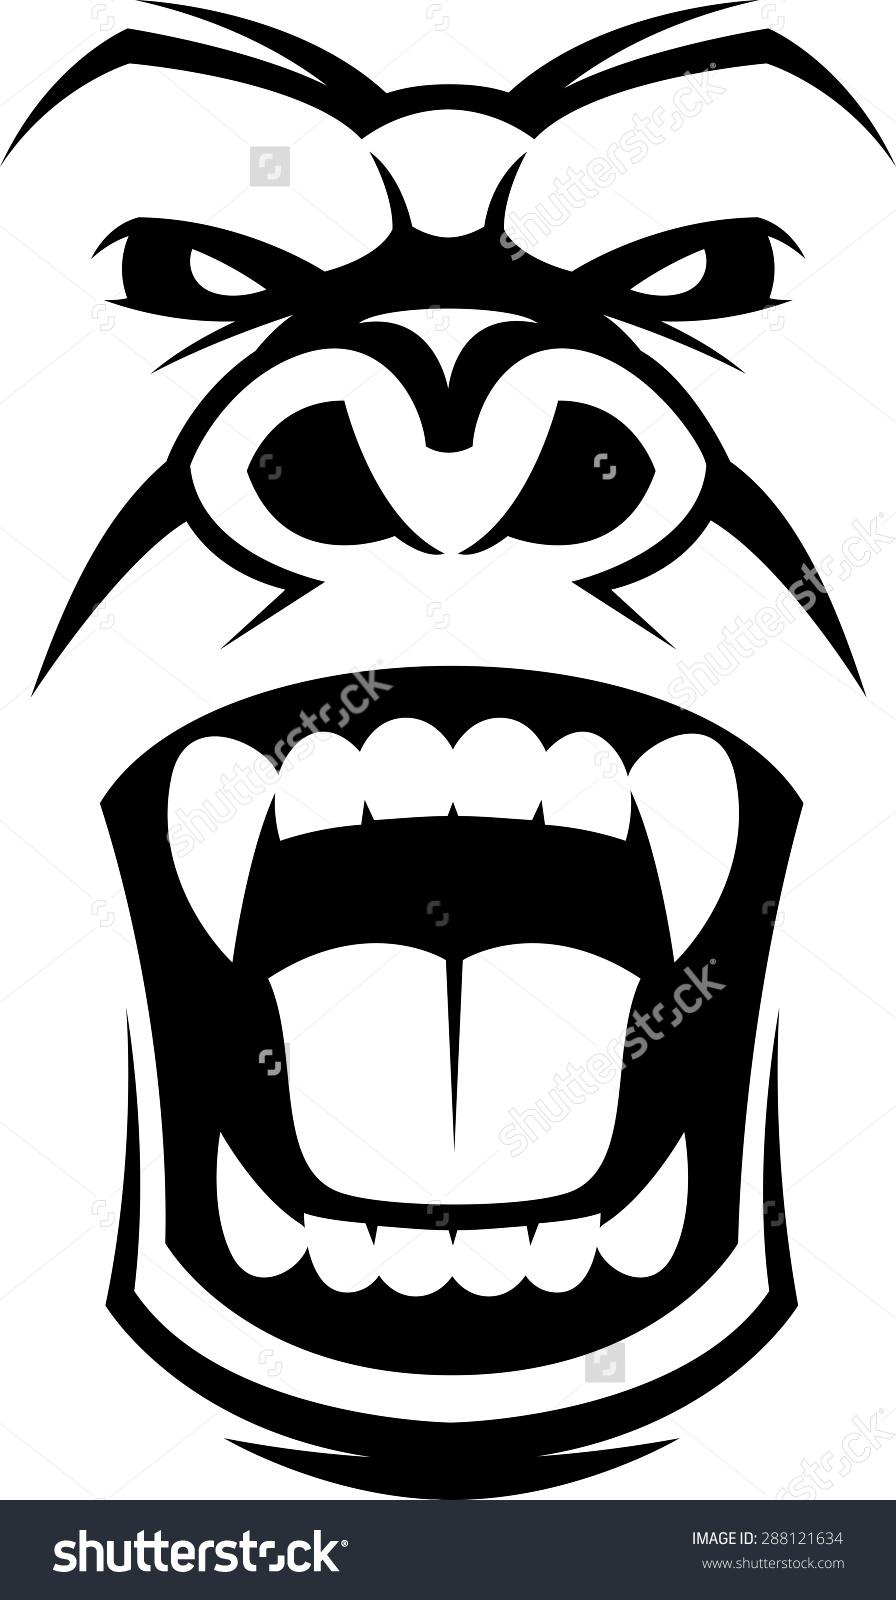 clipart transparent library Ape clipart gorilla face. Transparent free